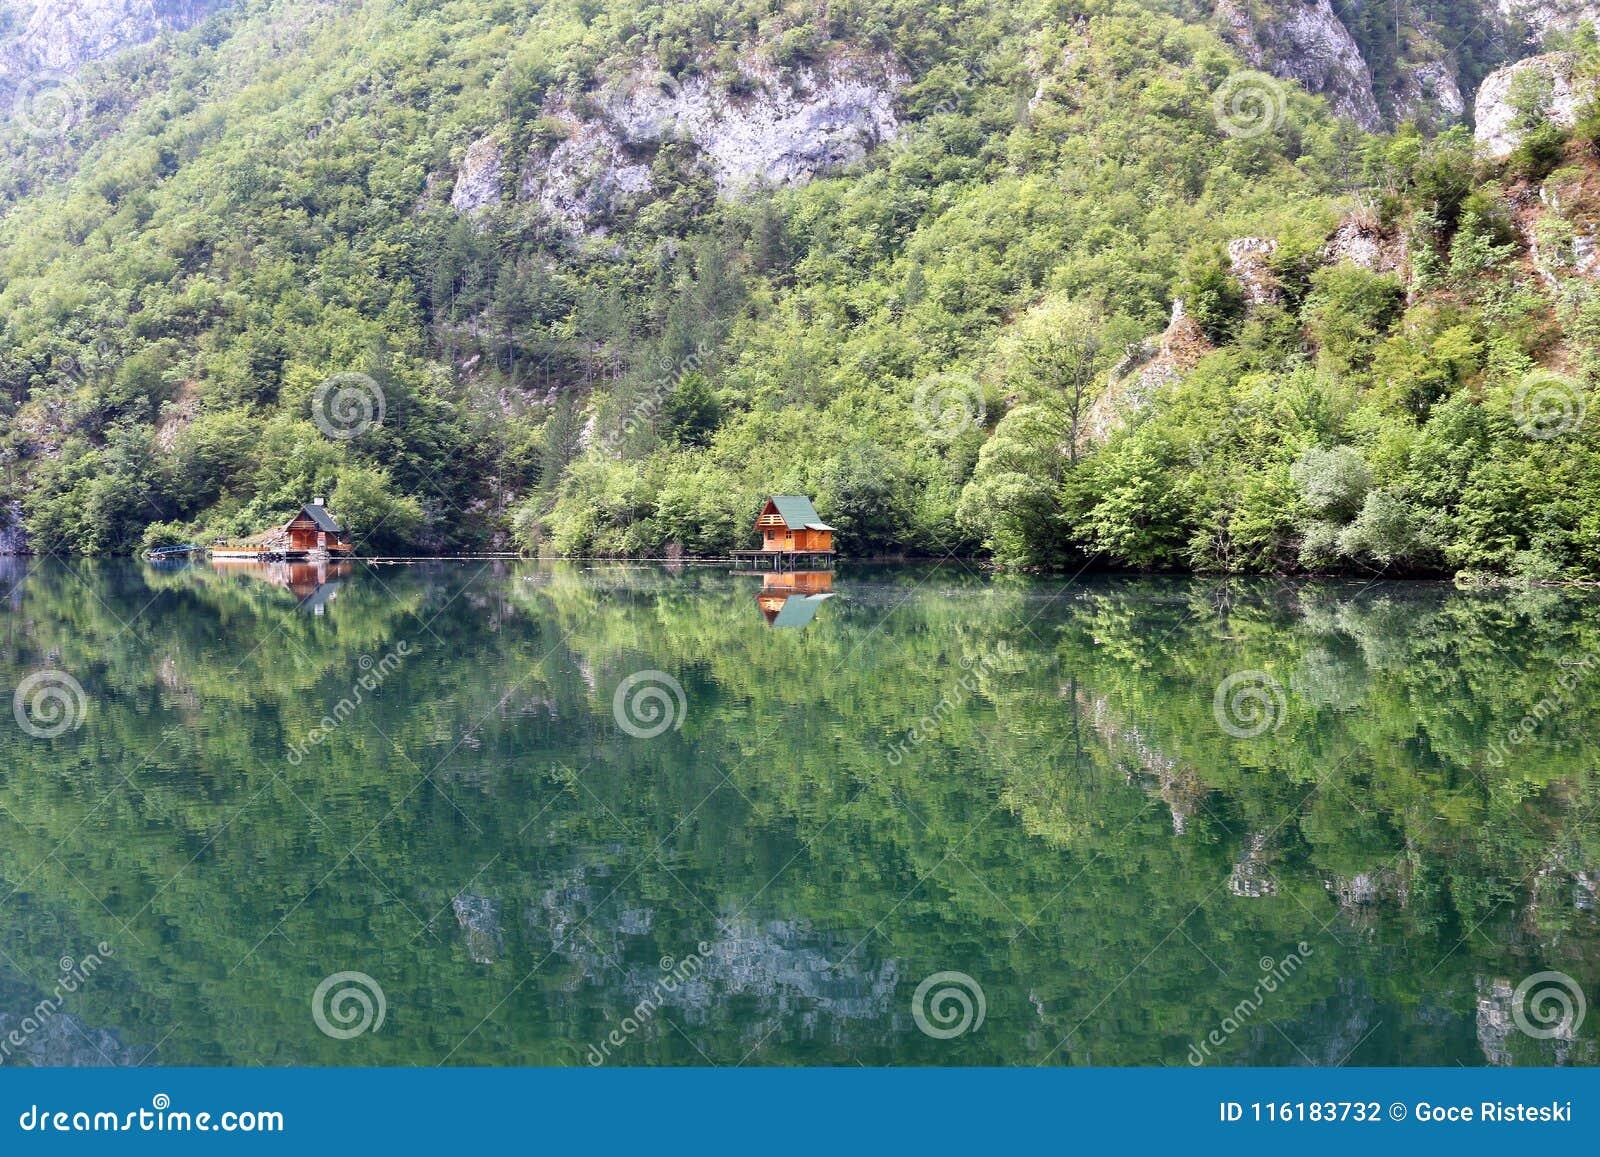 Wooden houses on river Drina landscape summer